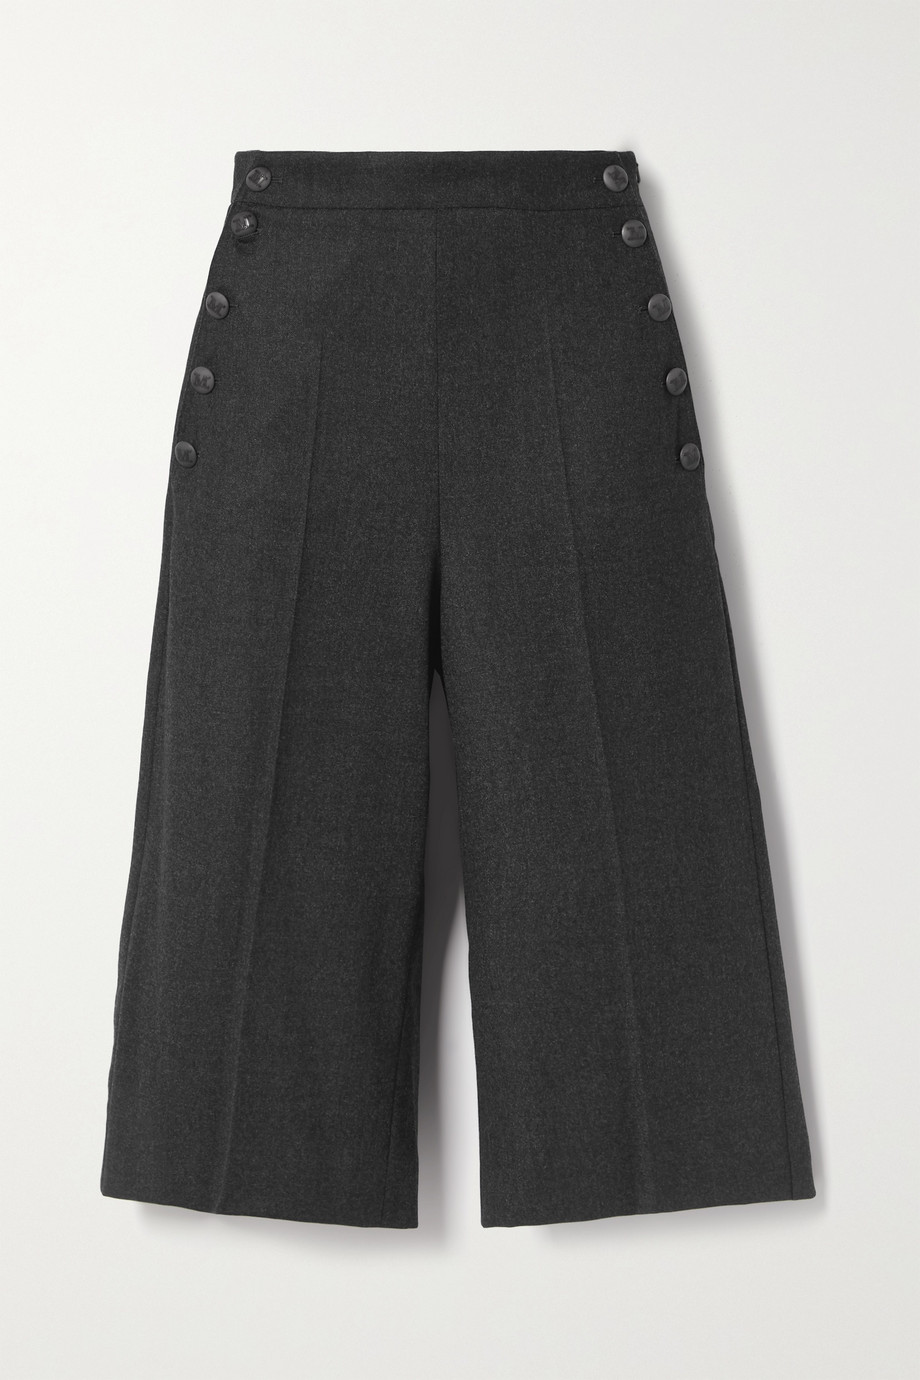 Max Mara 羊毛混纺短裤